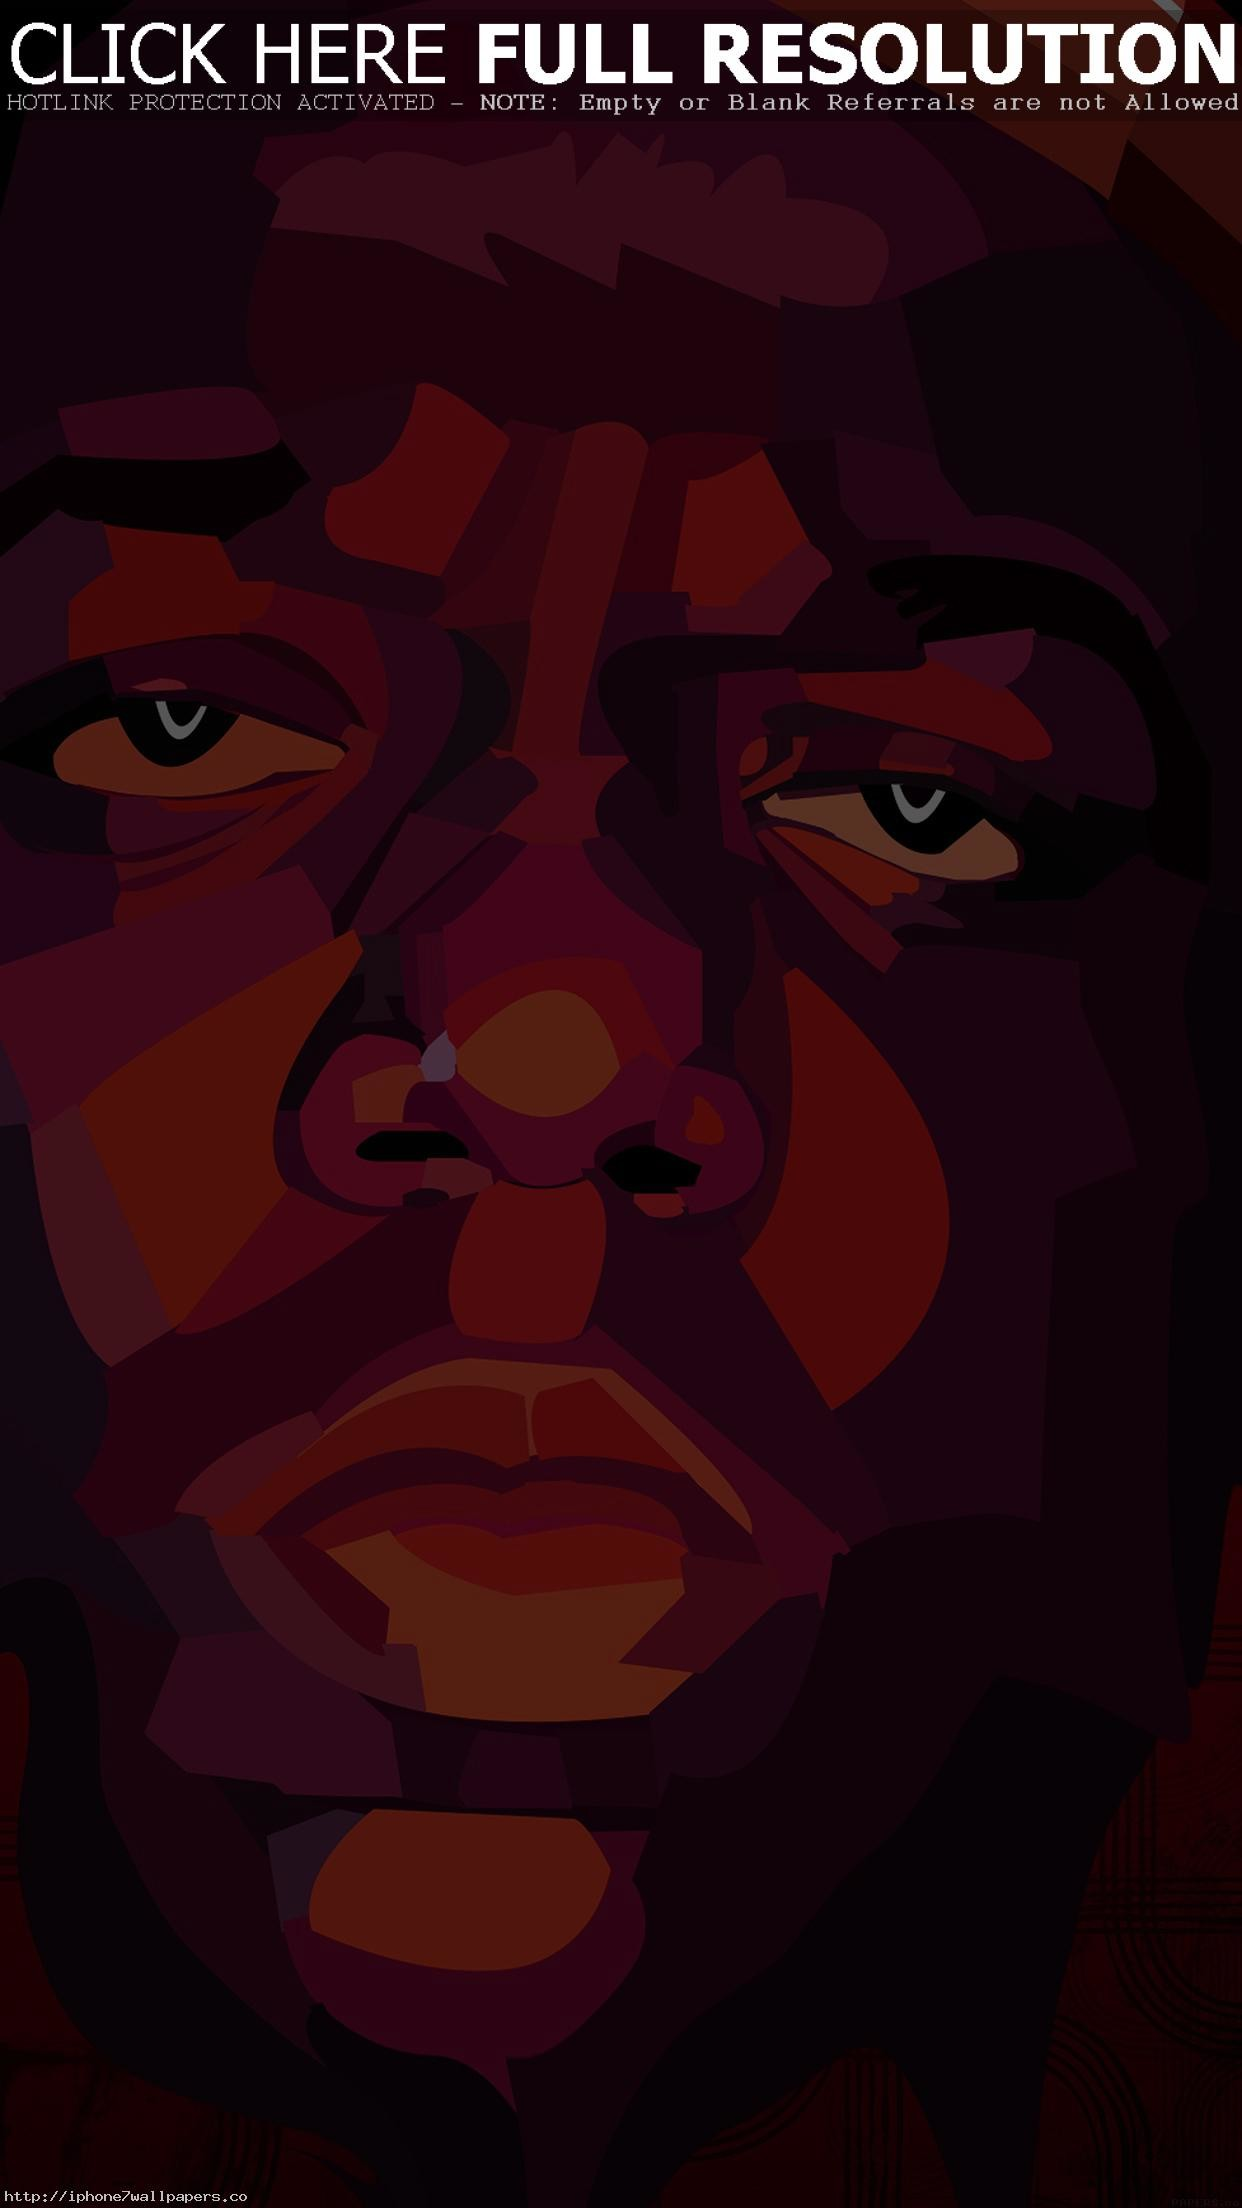 … biggie smalls notorious big rapper music android wallpaper …